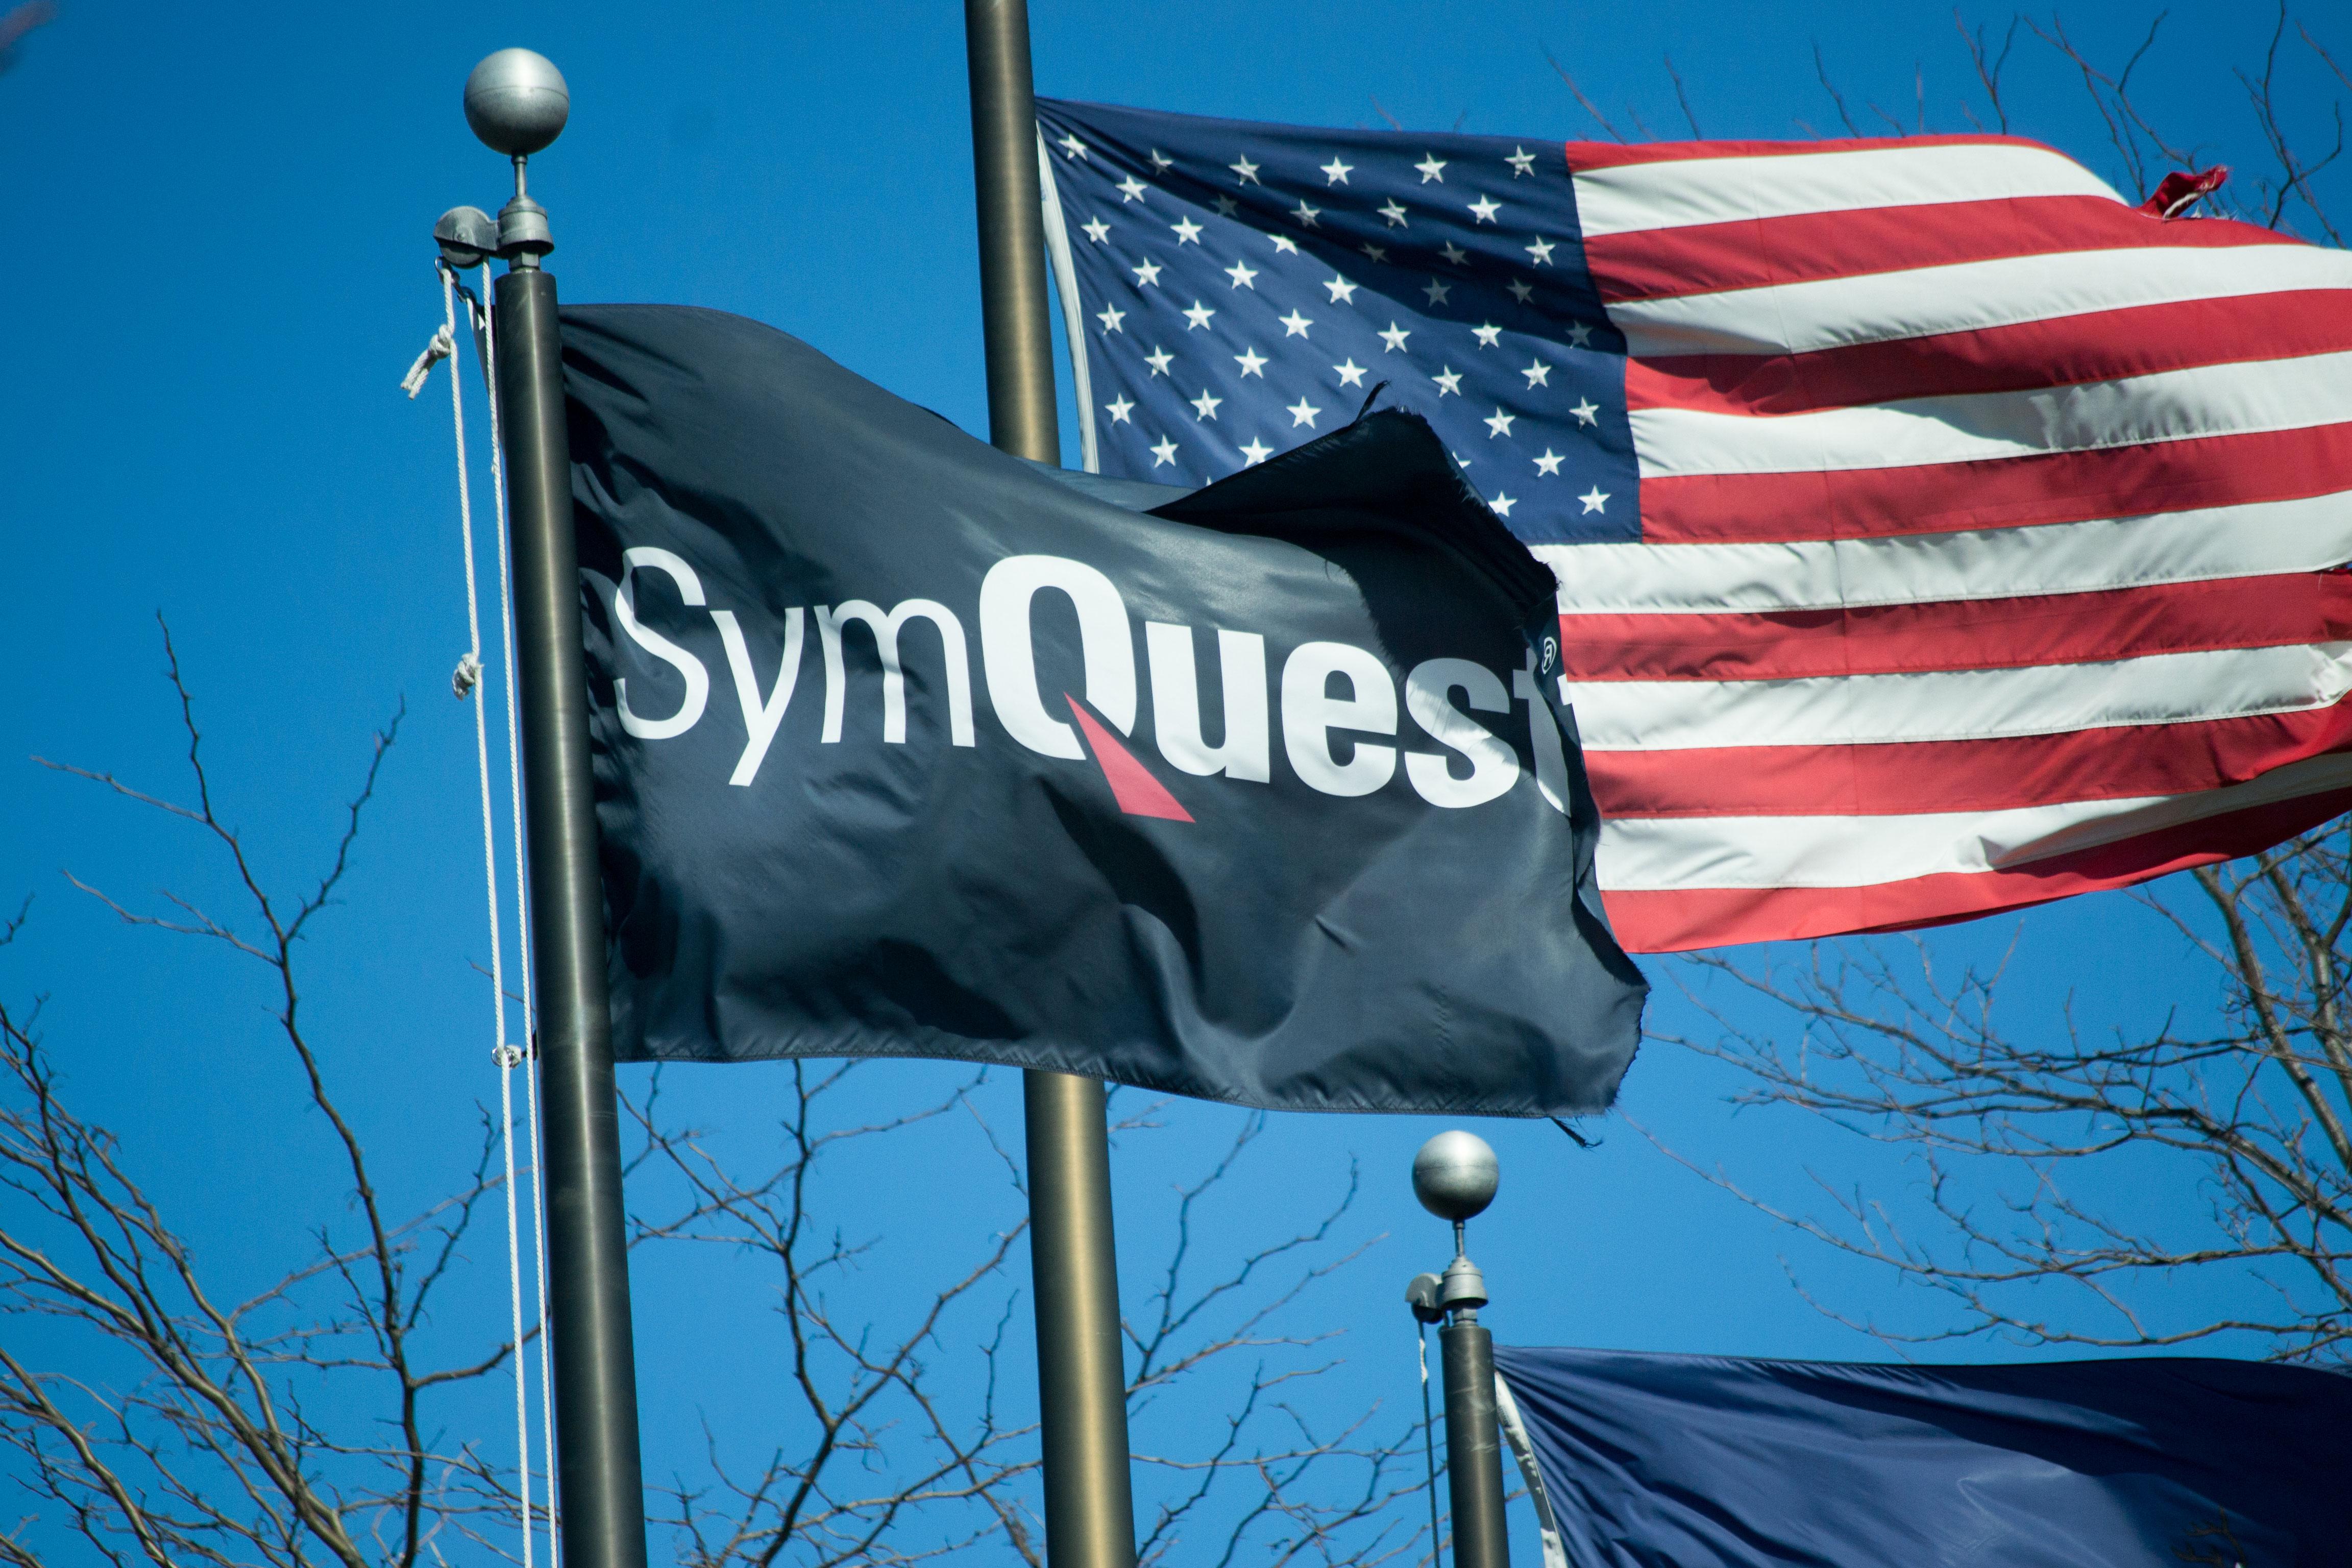 SymQuest-and-American-Flag.jpg